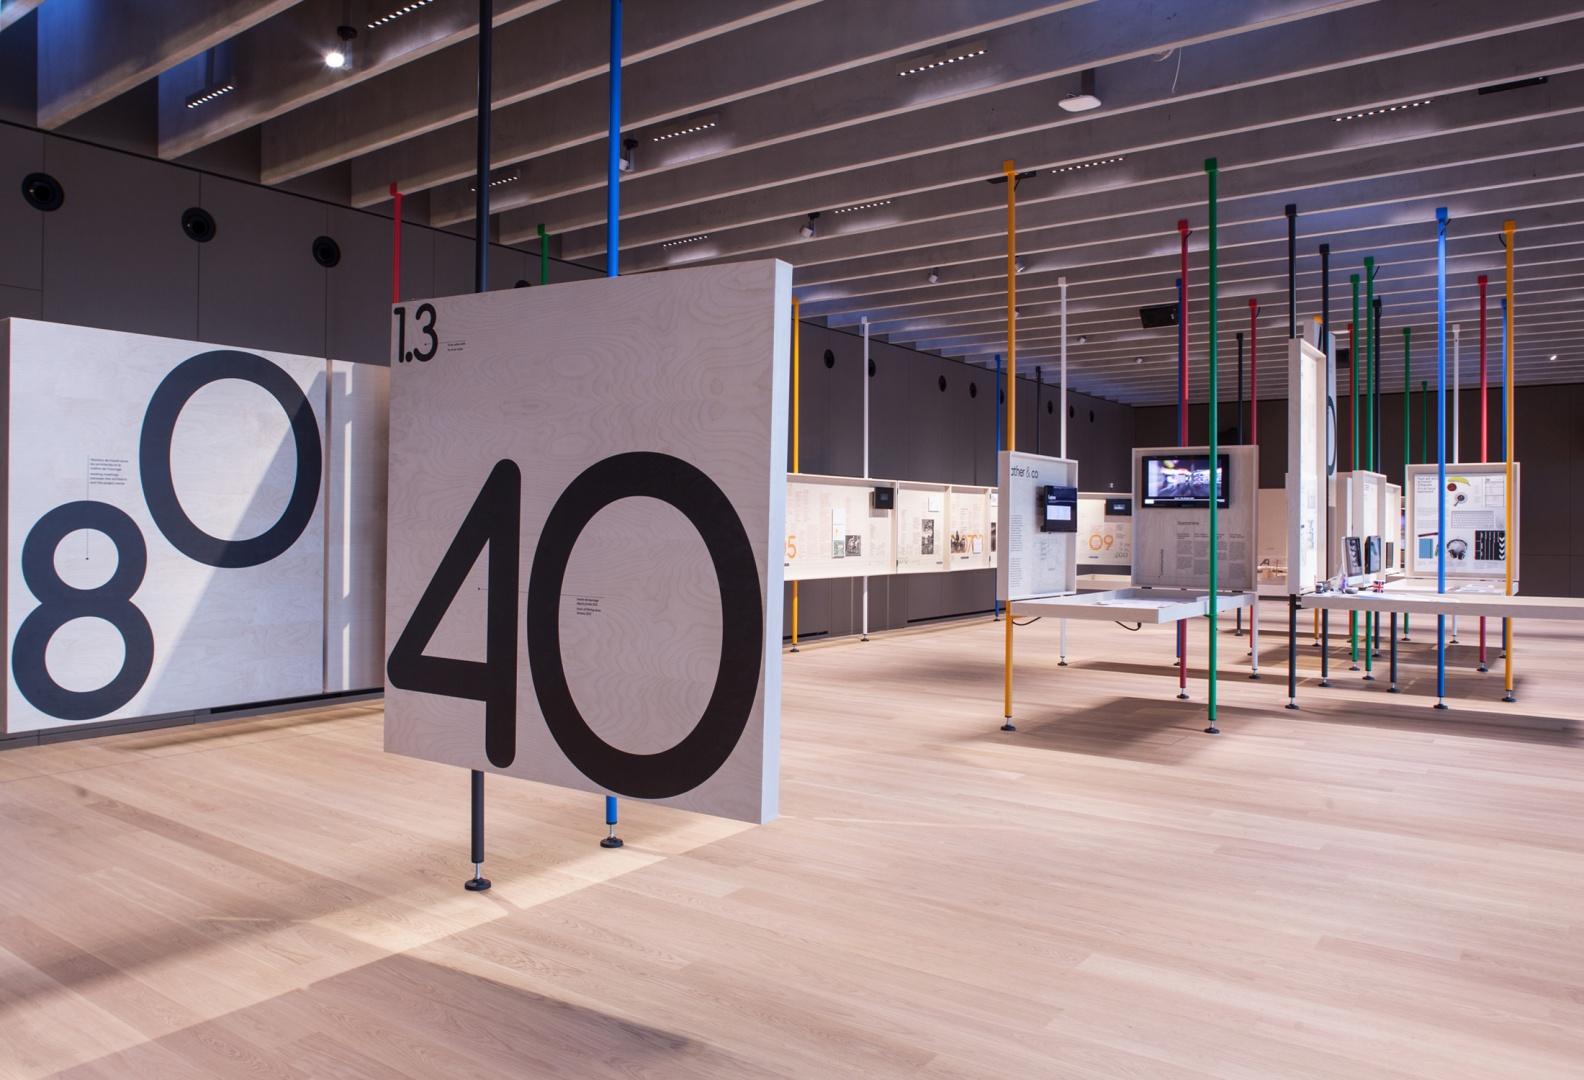 Salle expo Musée olympique © Brauen Wälchli Architectes